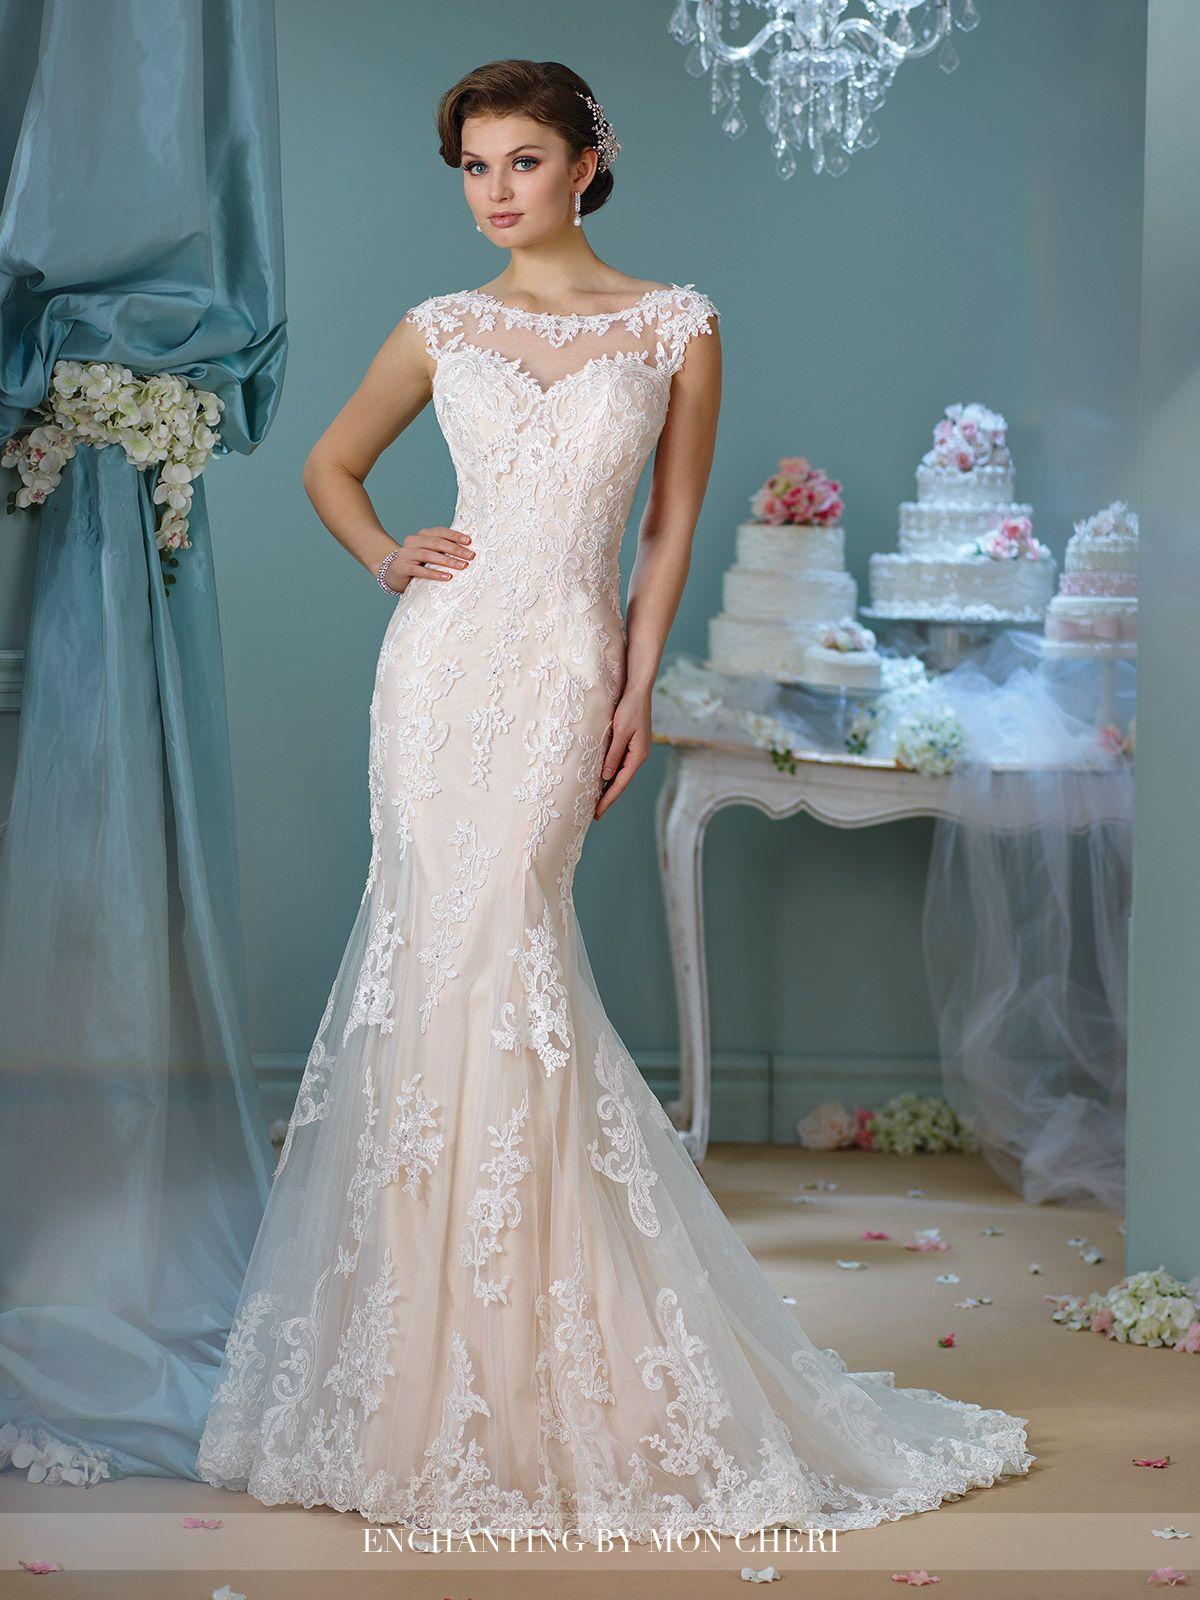 Illusion neckline wedding dress illusions bodice and neckline